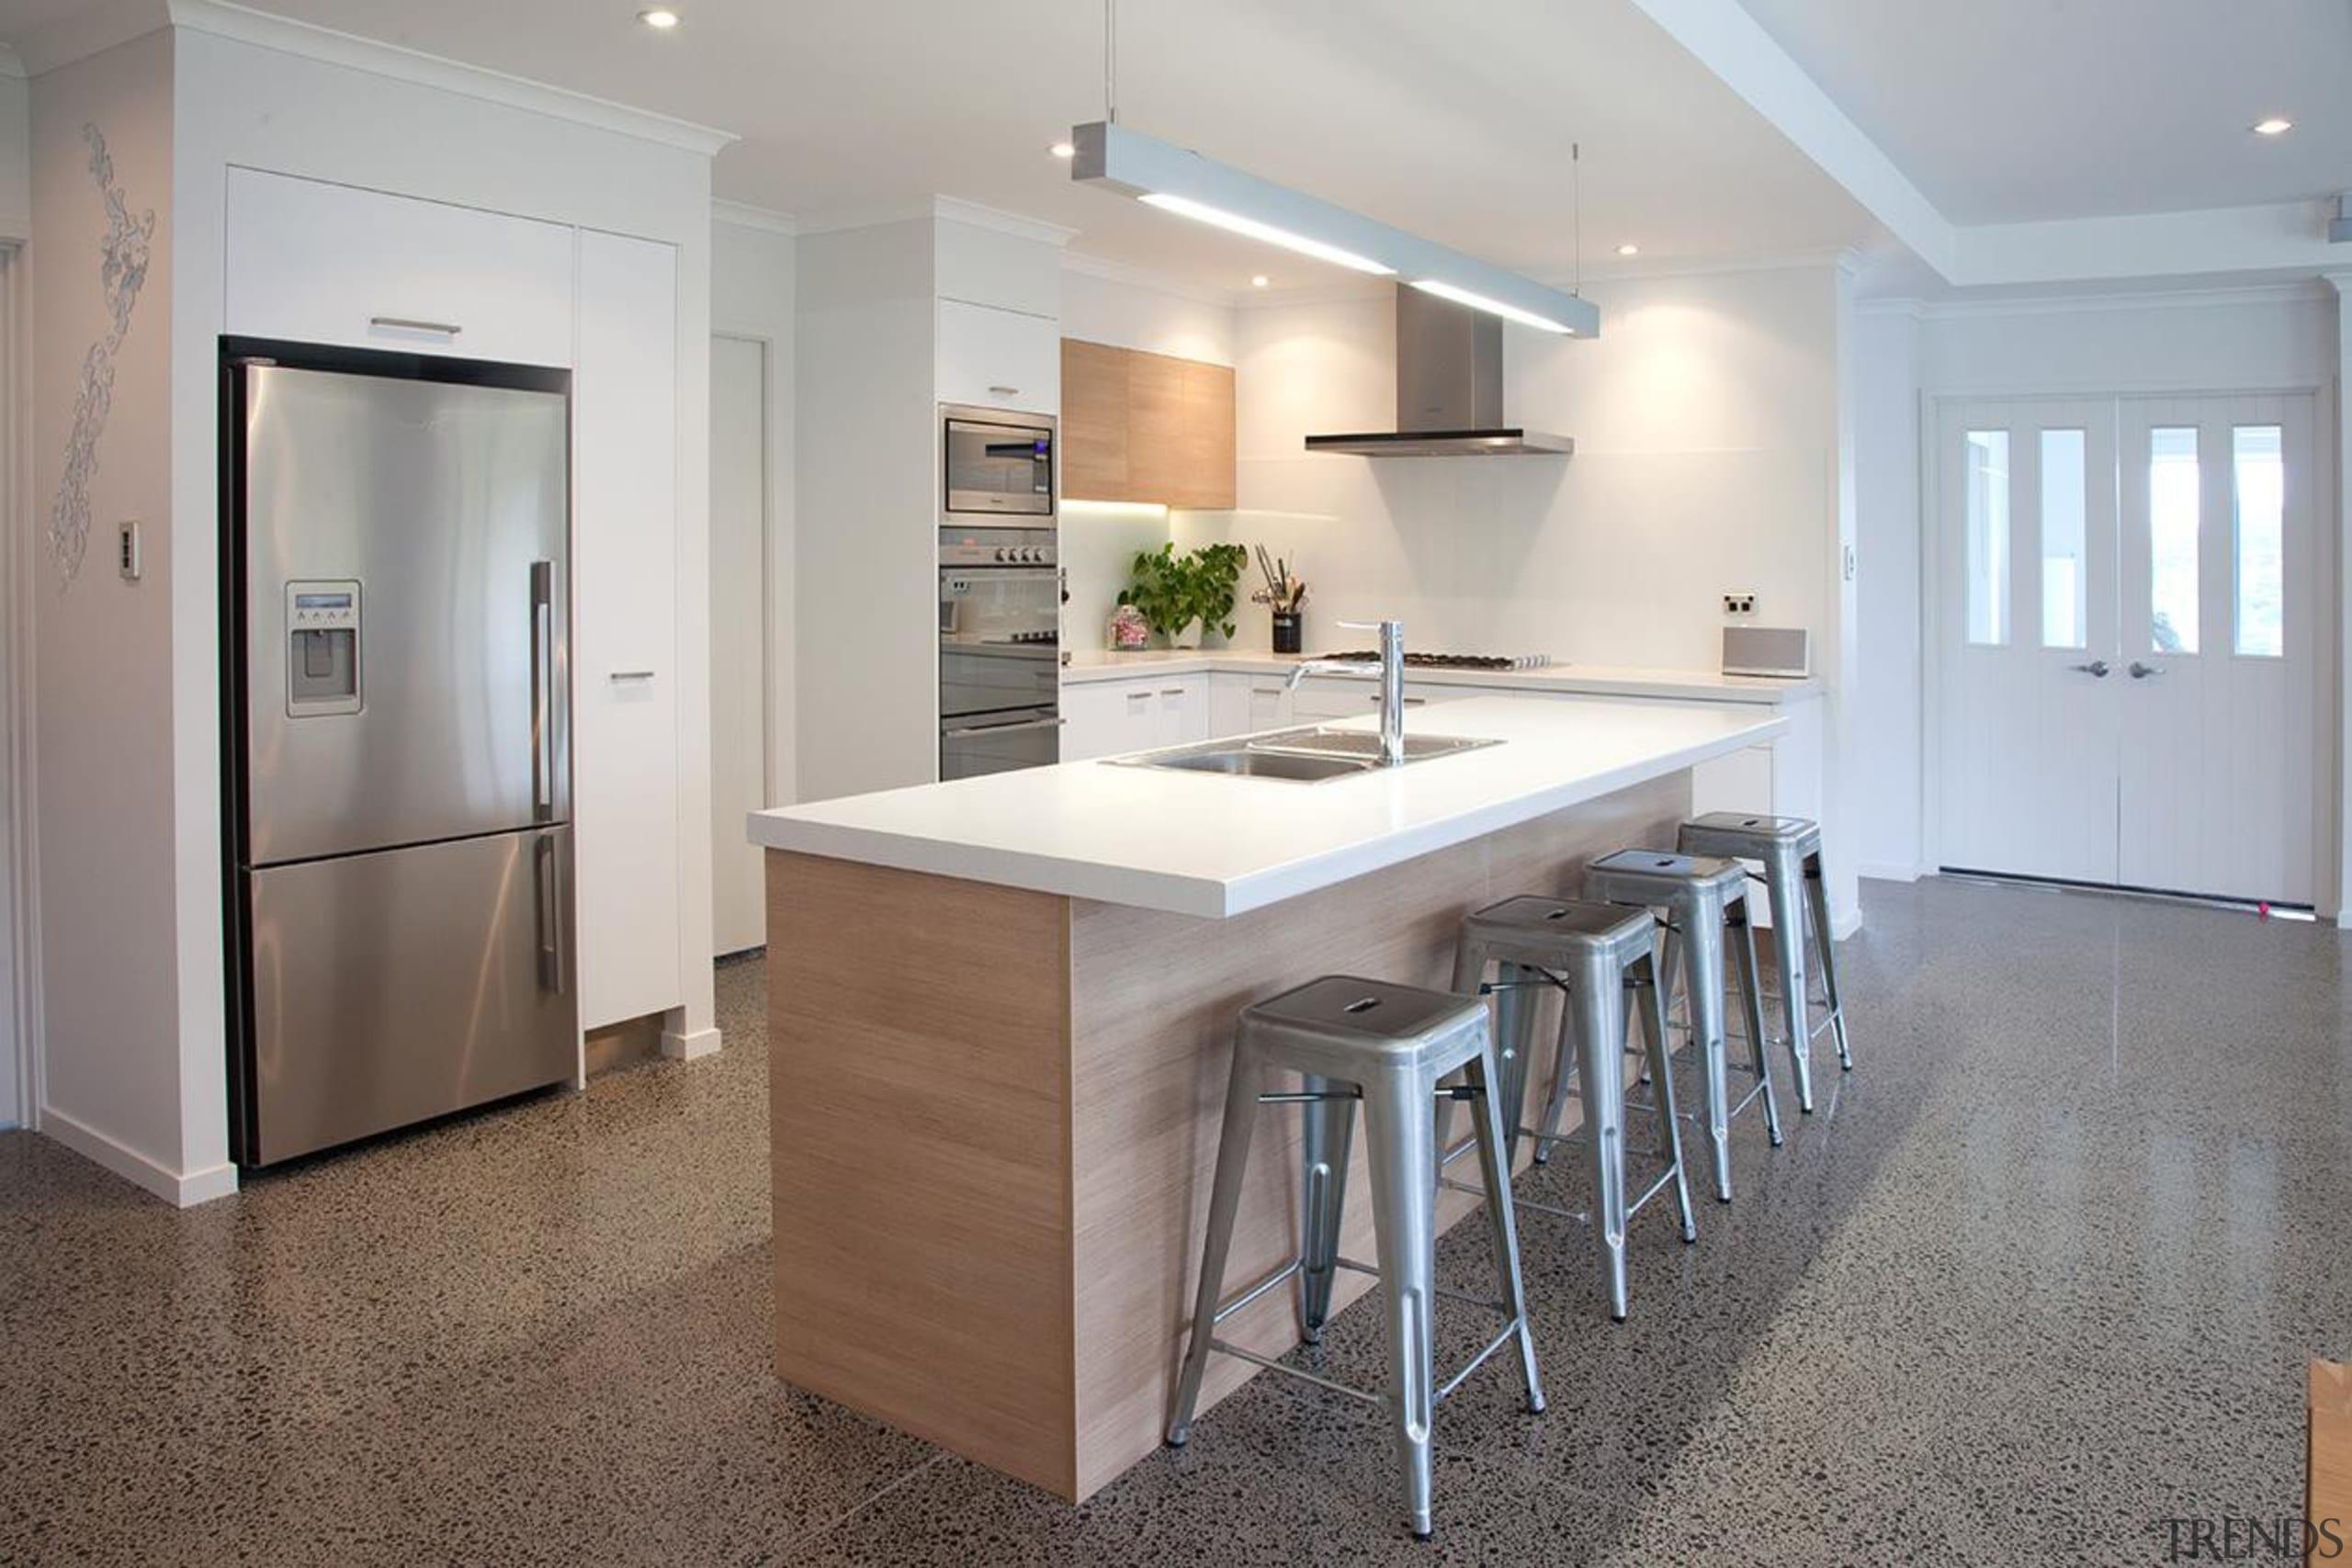 For more information, please visit www.gjgardner.co.nz cabinetry, countertop, cuisine classique, floor, flooring, interior design, kitchen, real estate, room, wood flooring, gray